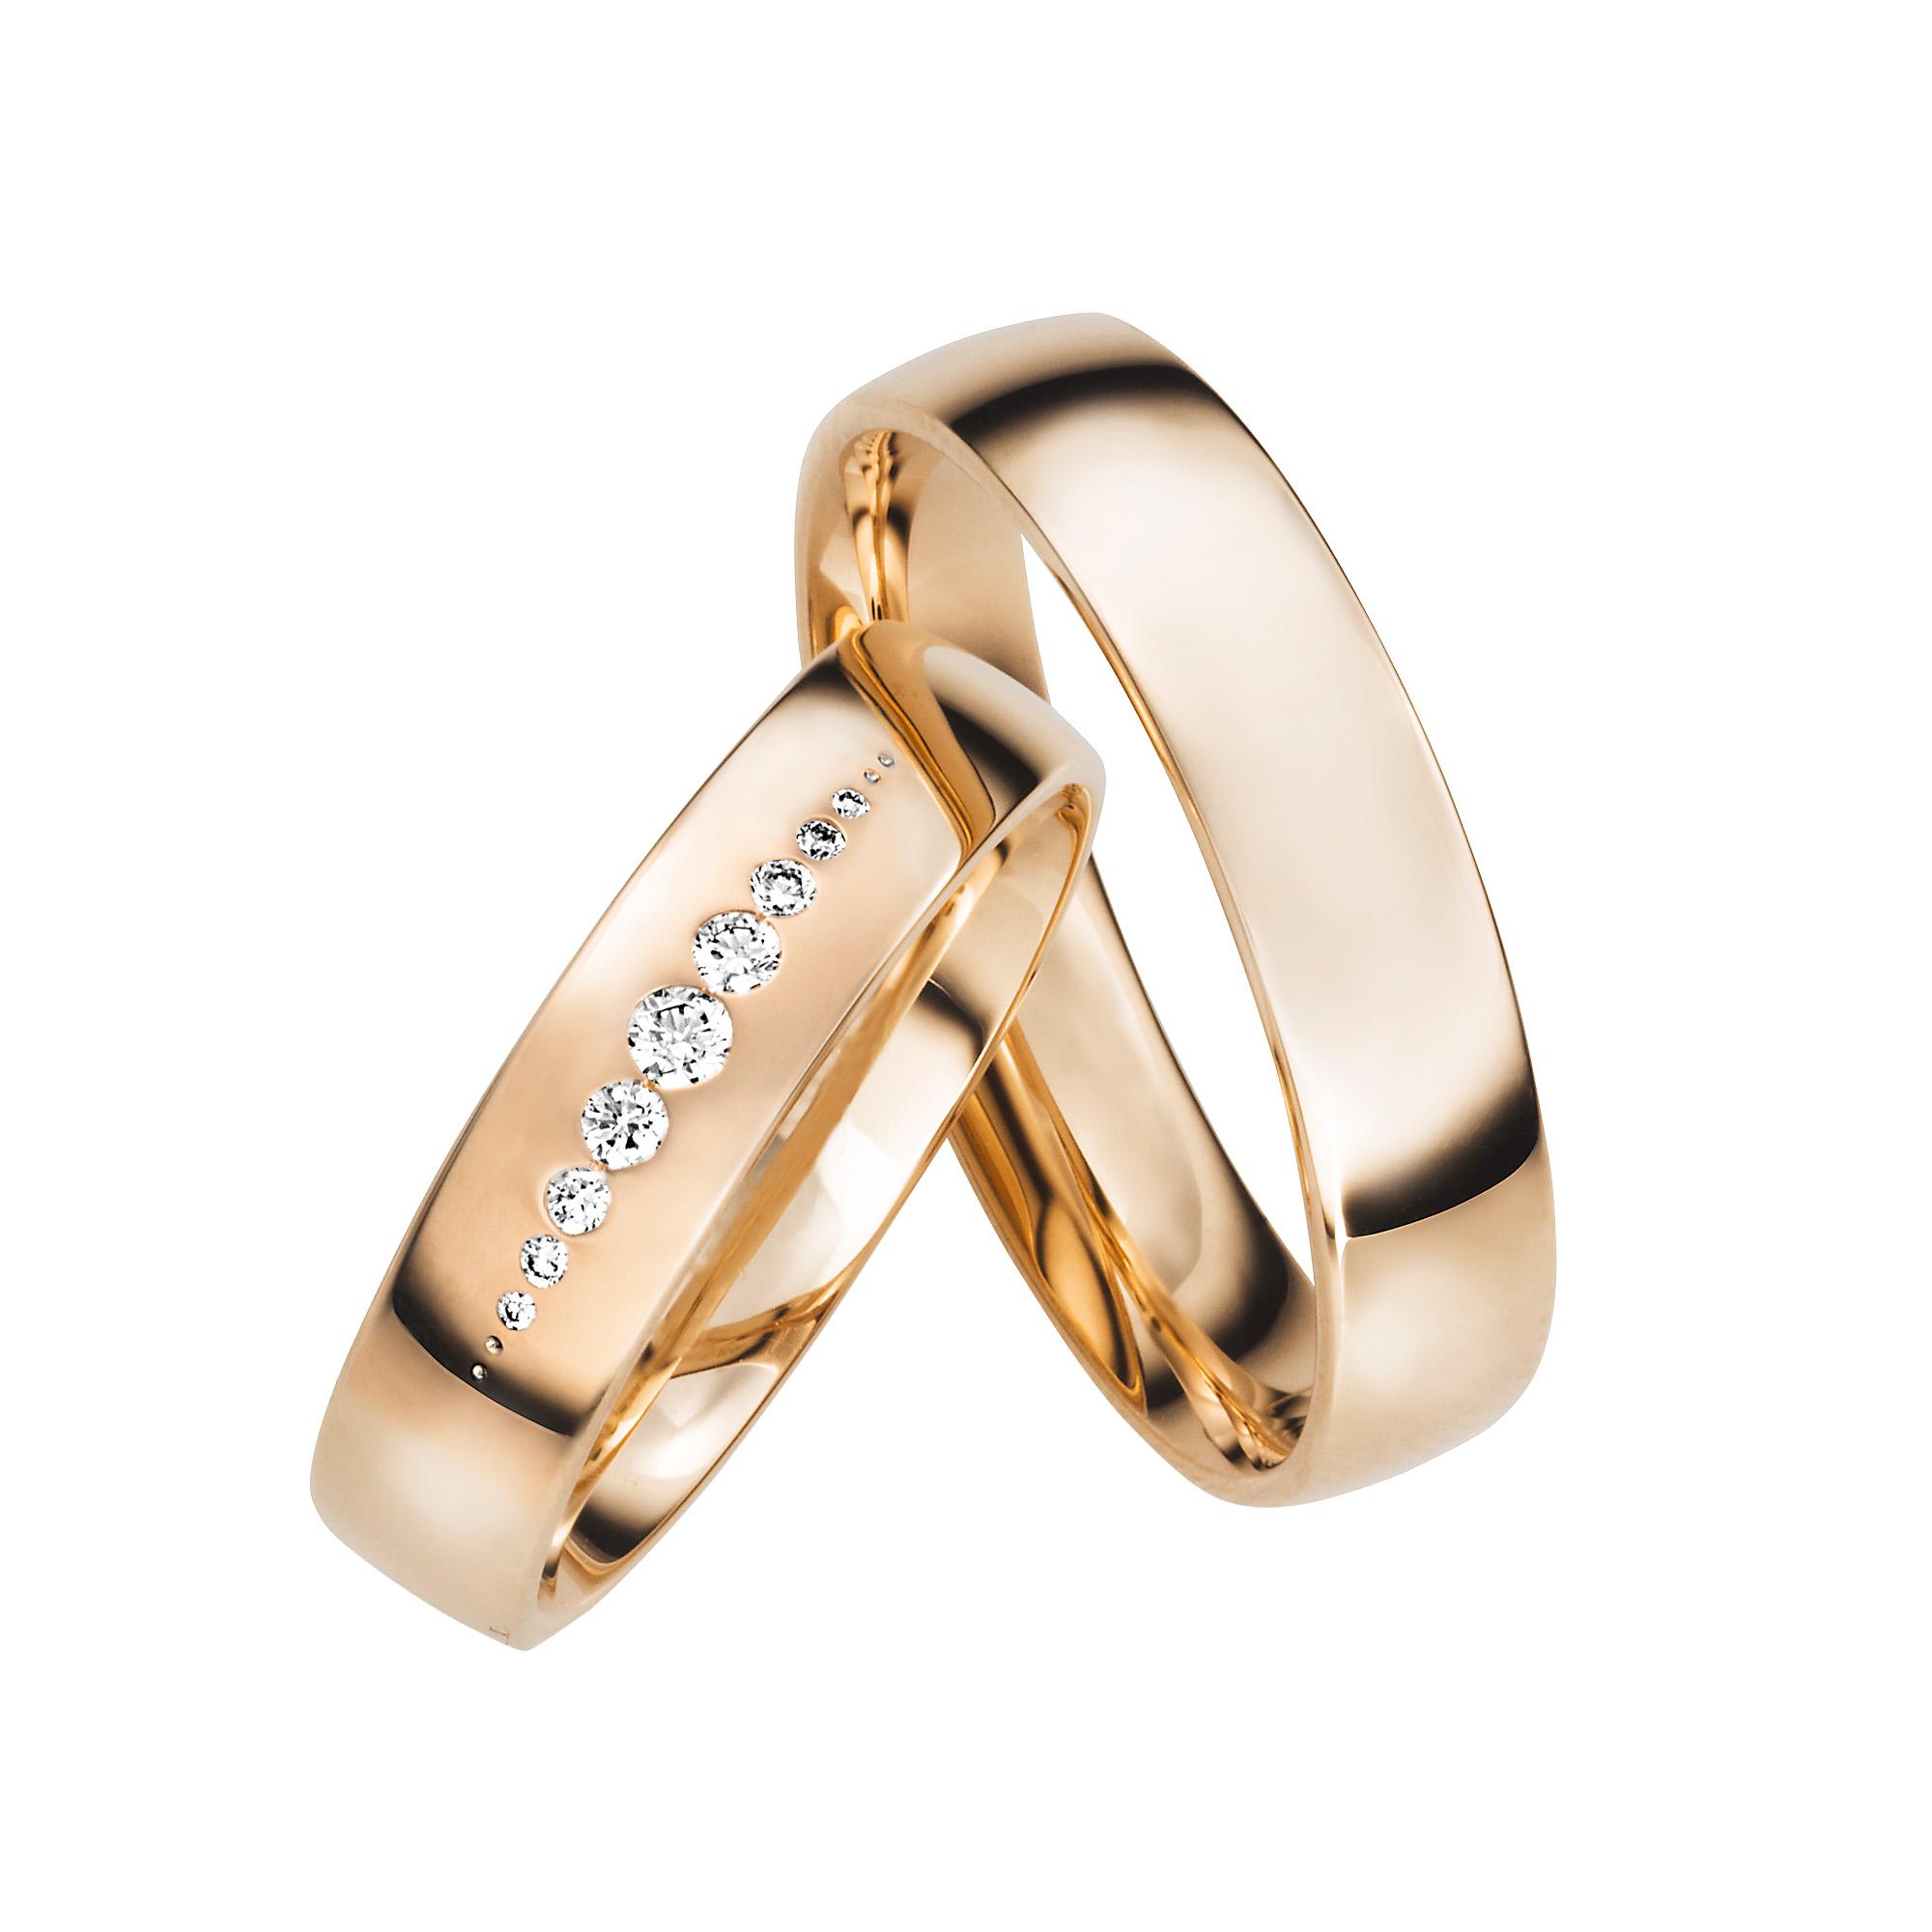 Juwelier Kraemer Trauringe 585  Gold  63 mm  Juwelier